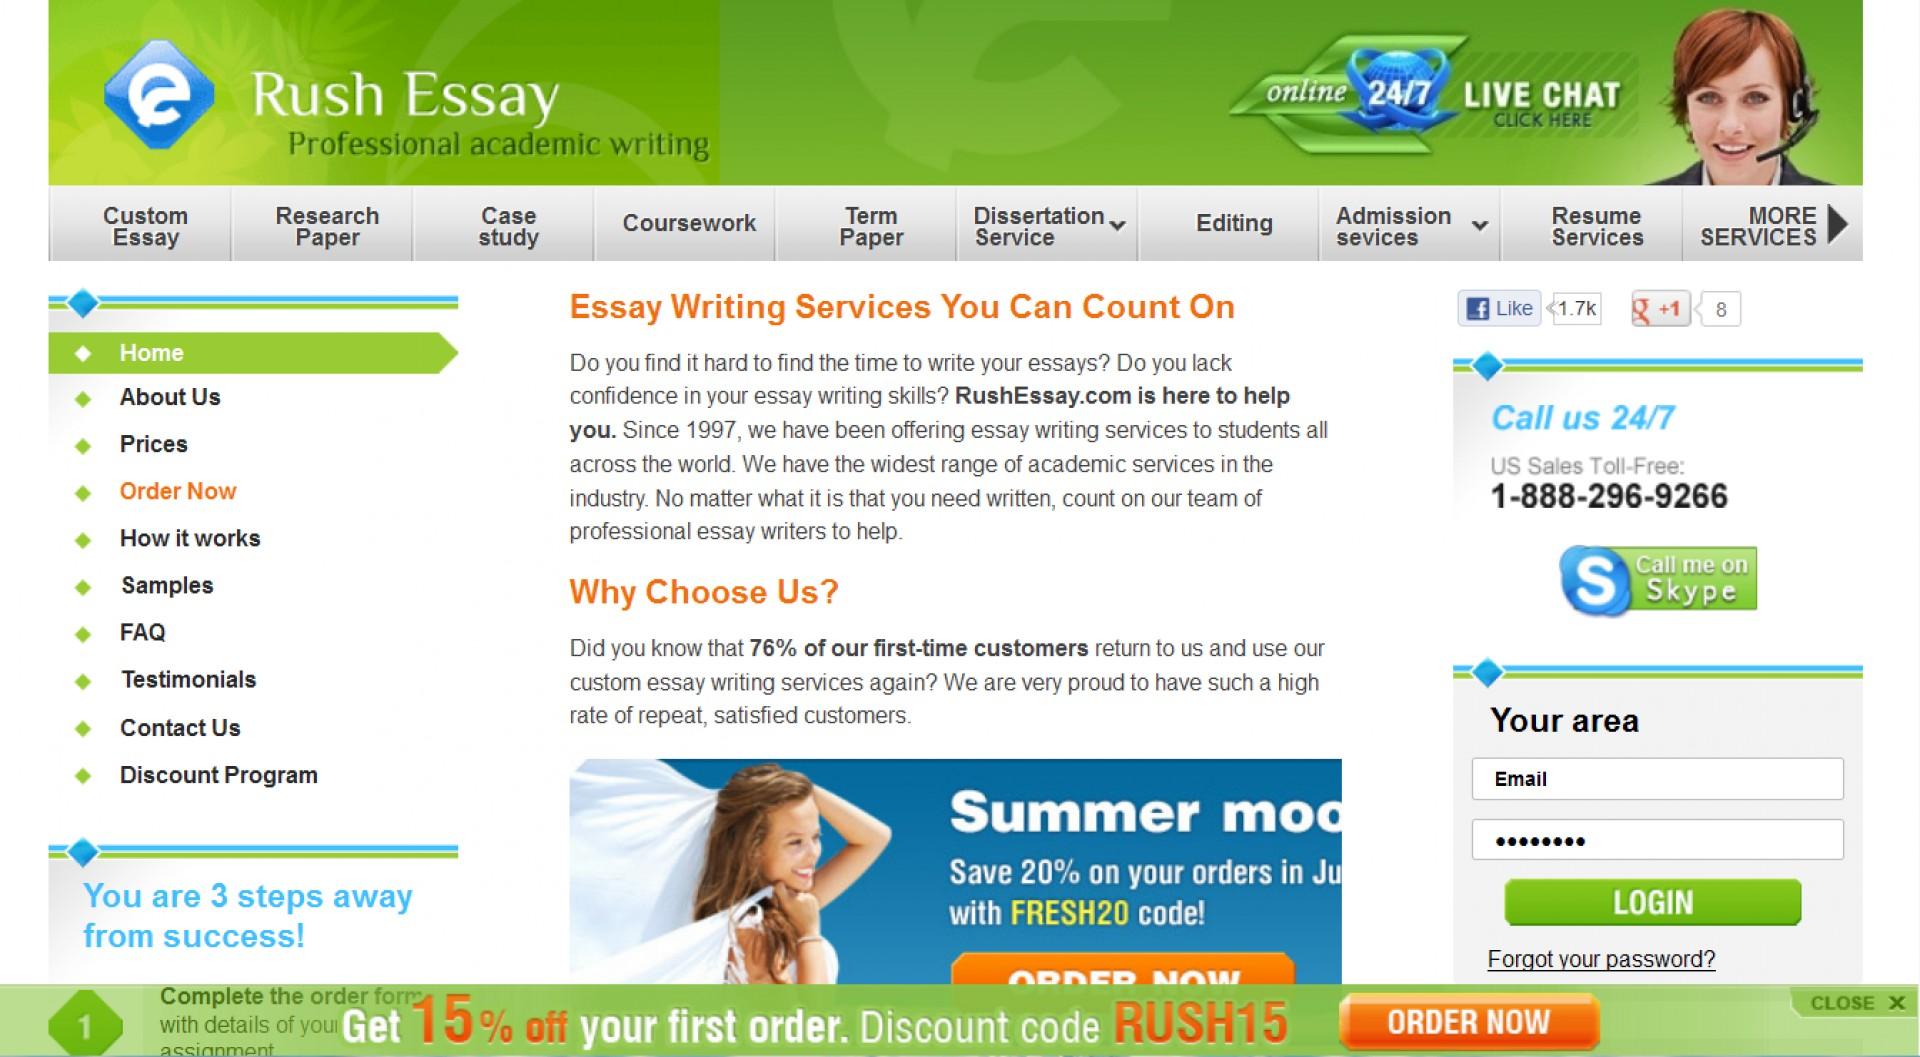 012 Rushessay Rush Essay Surprising Huffington Post My Reviews Essay.com 1920